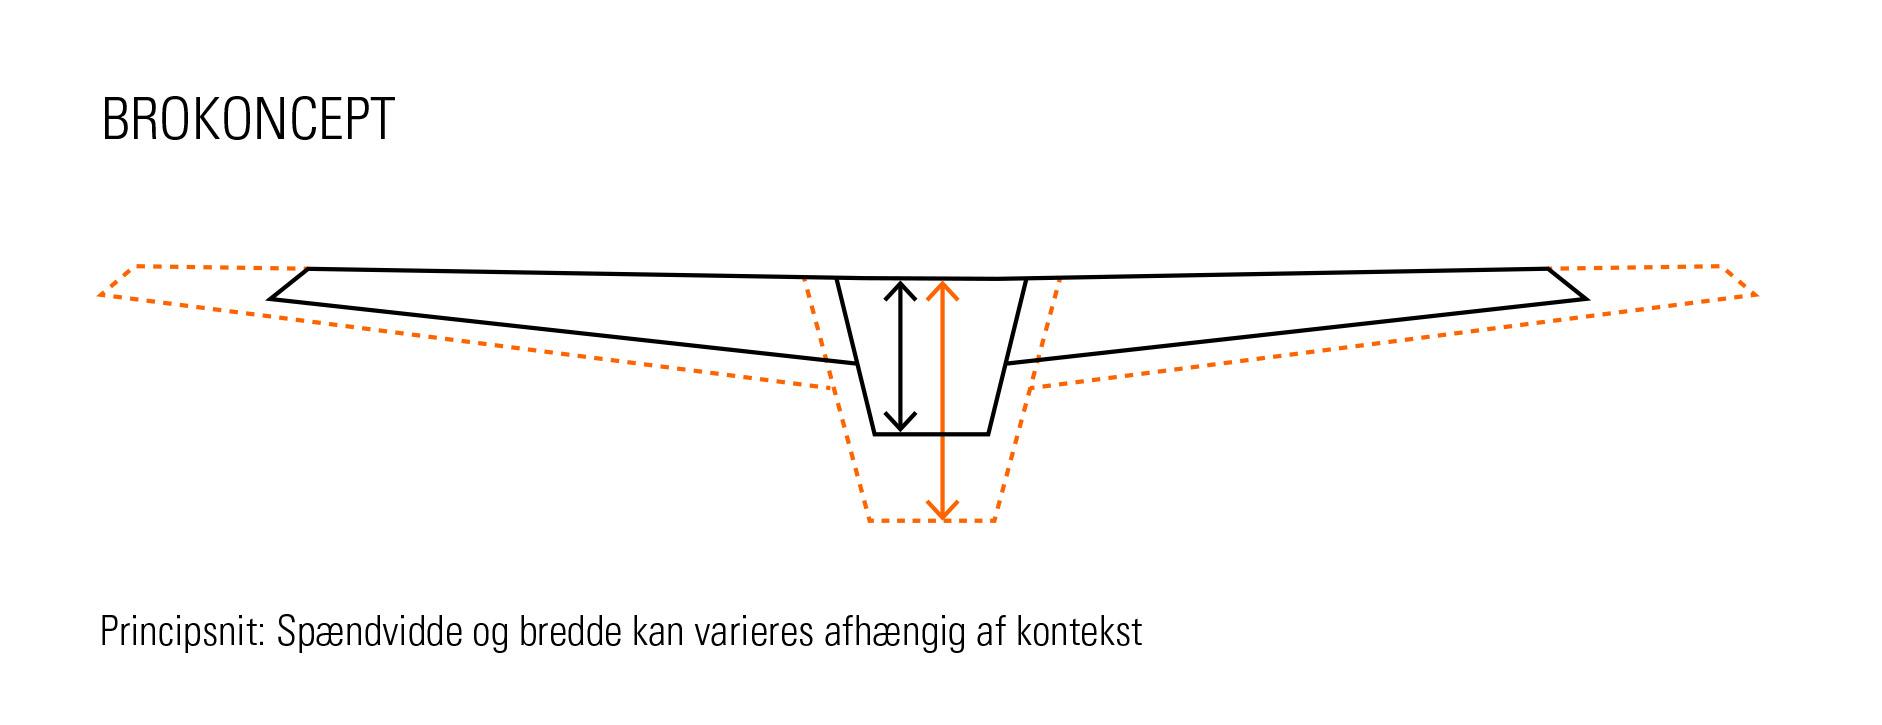 bro_koncept_diagrammer_principsnit.jpg